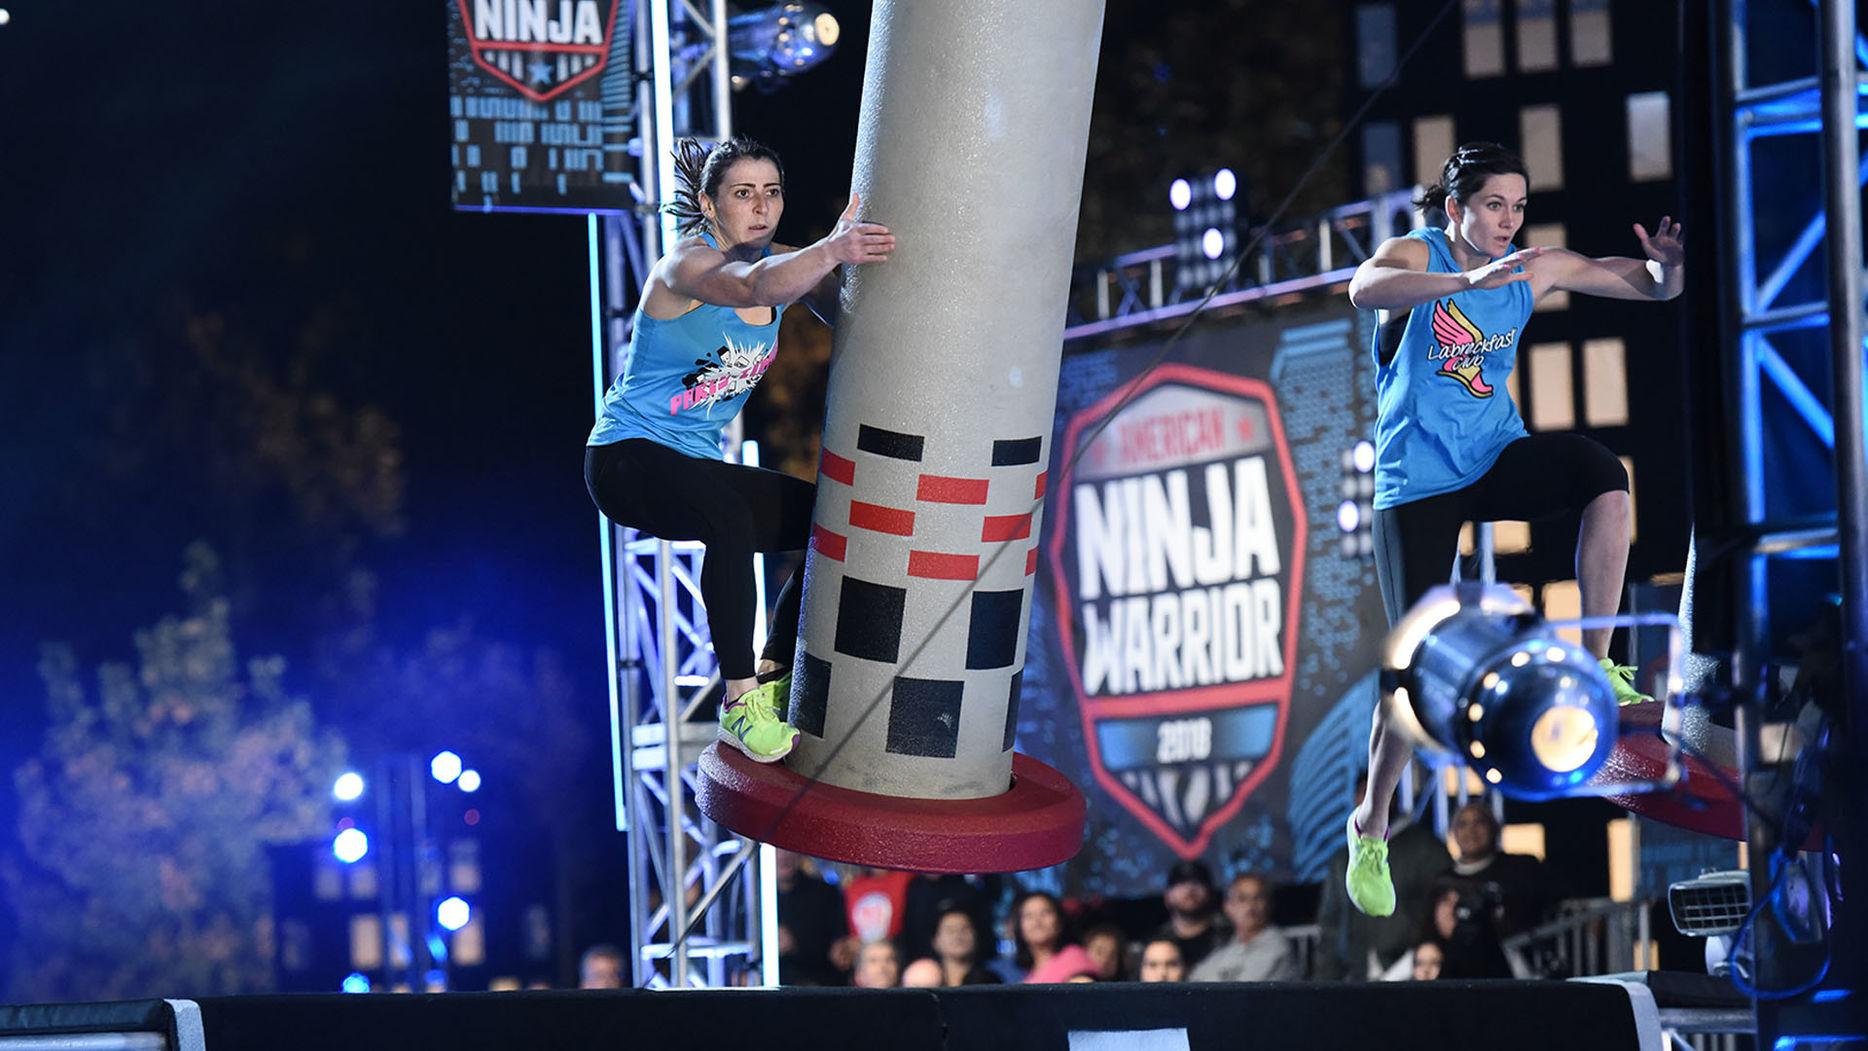 TV Recap: S01E16 – Ninja vs Ninja American Ninja Warrior Championship Finals